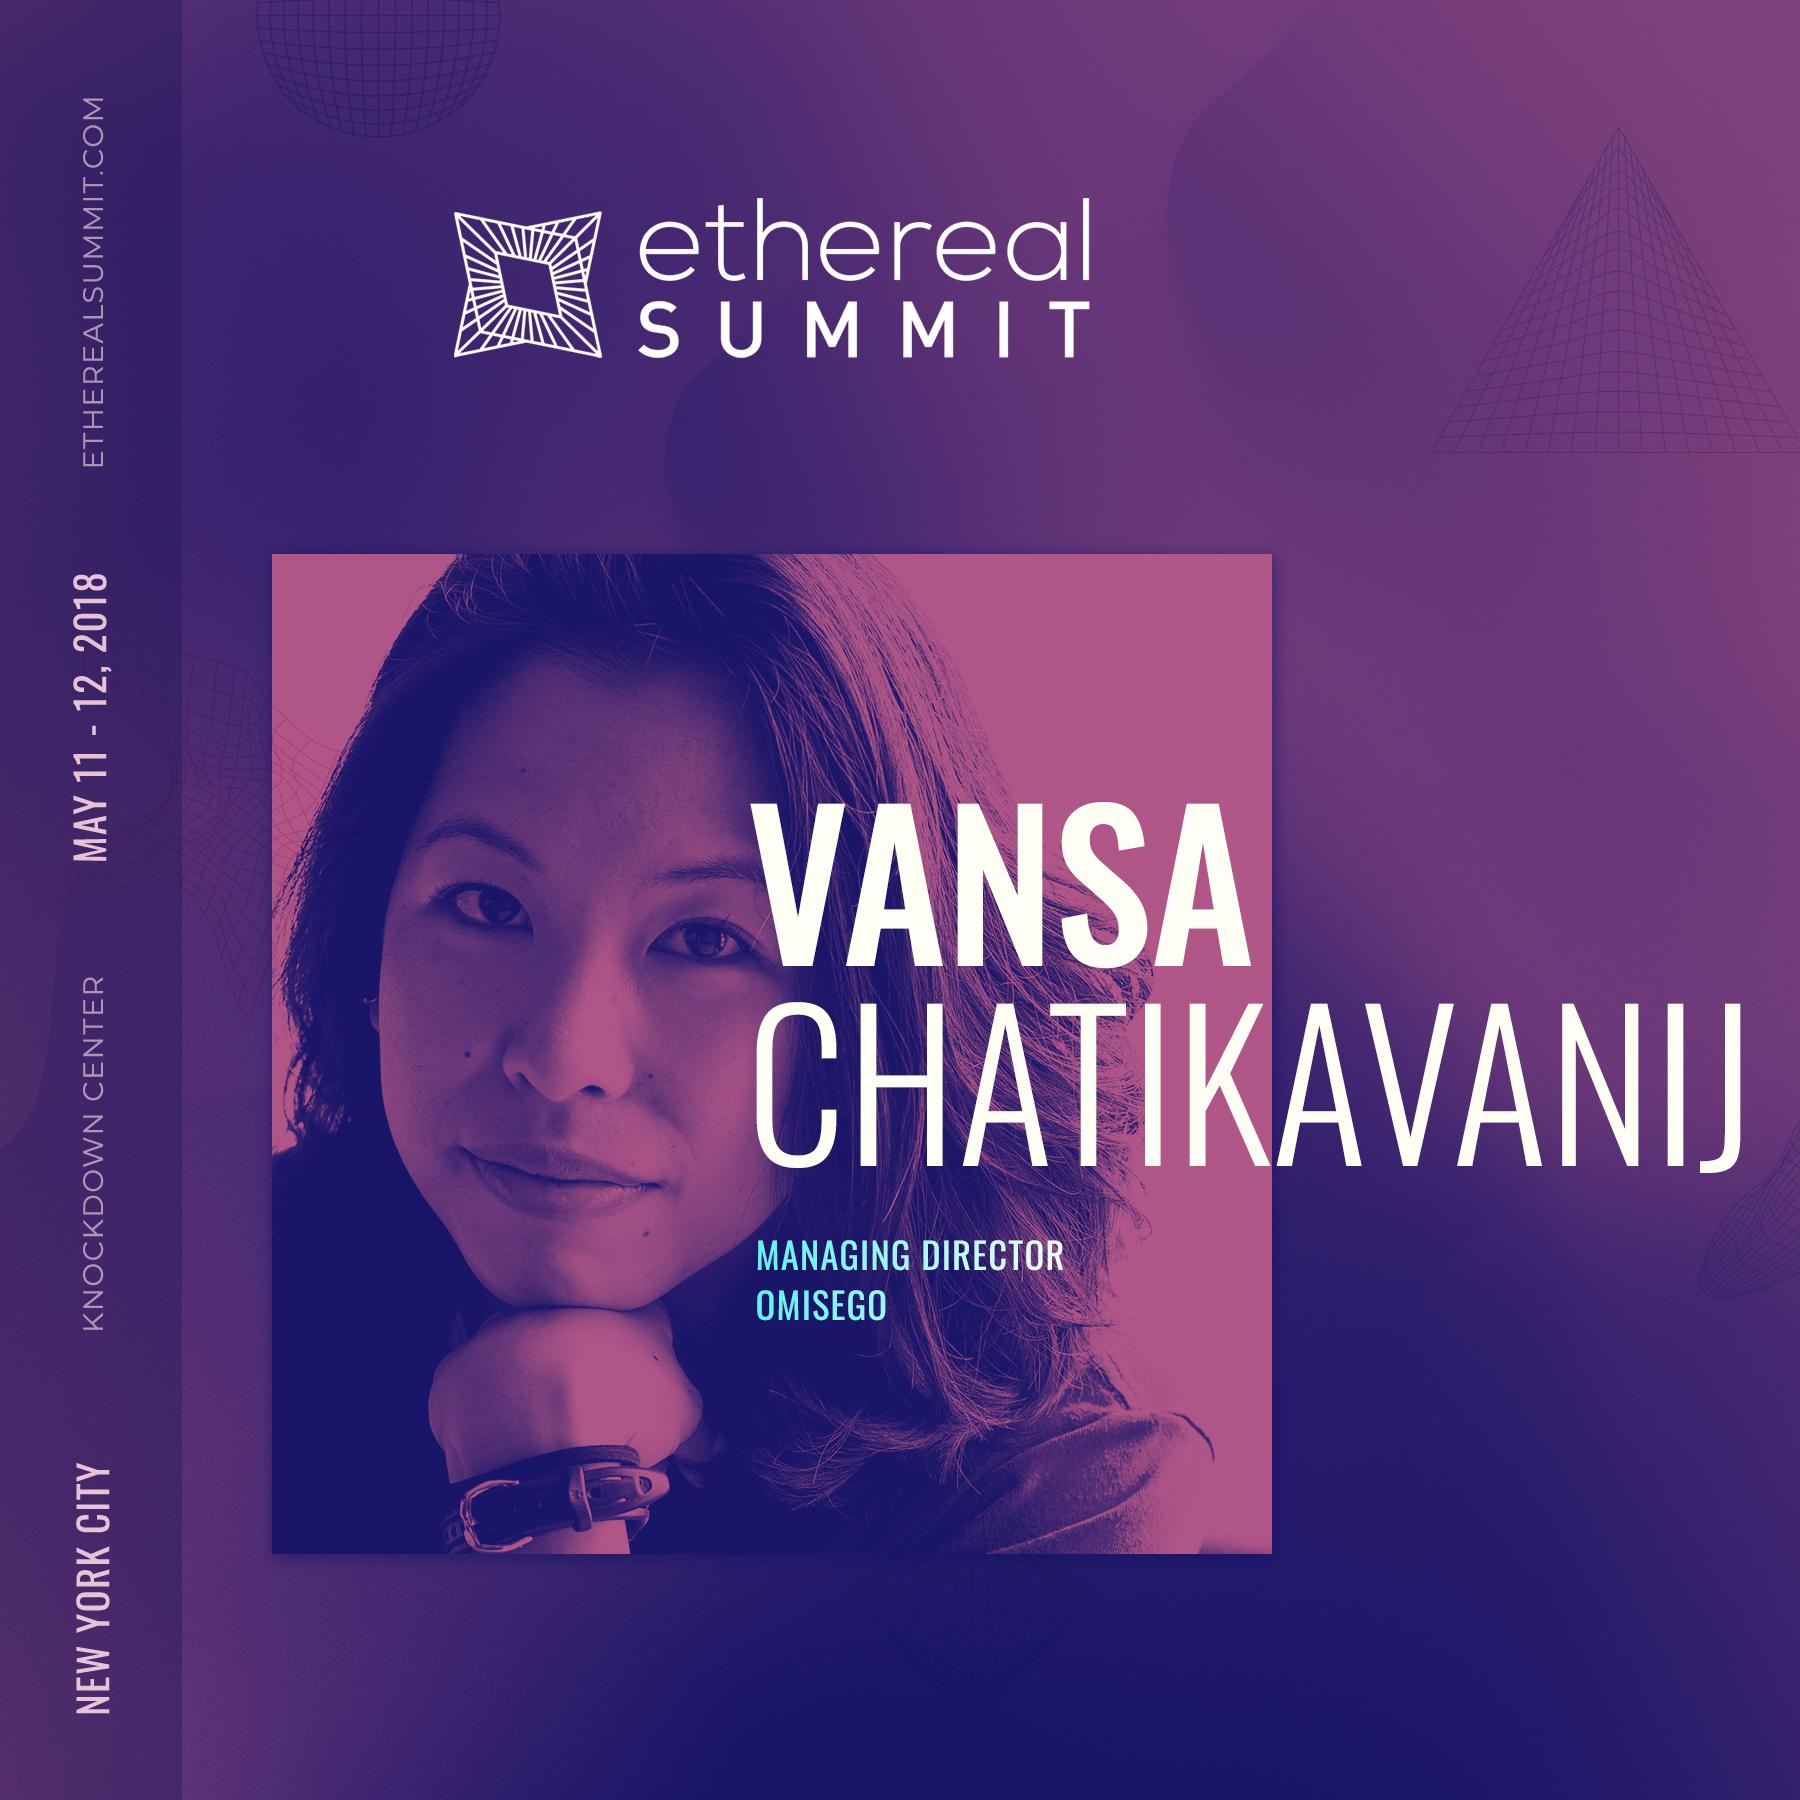 Vansa Chatikavanij